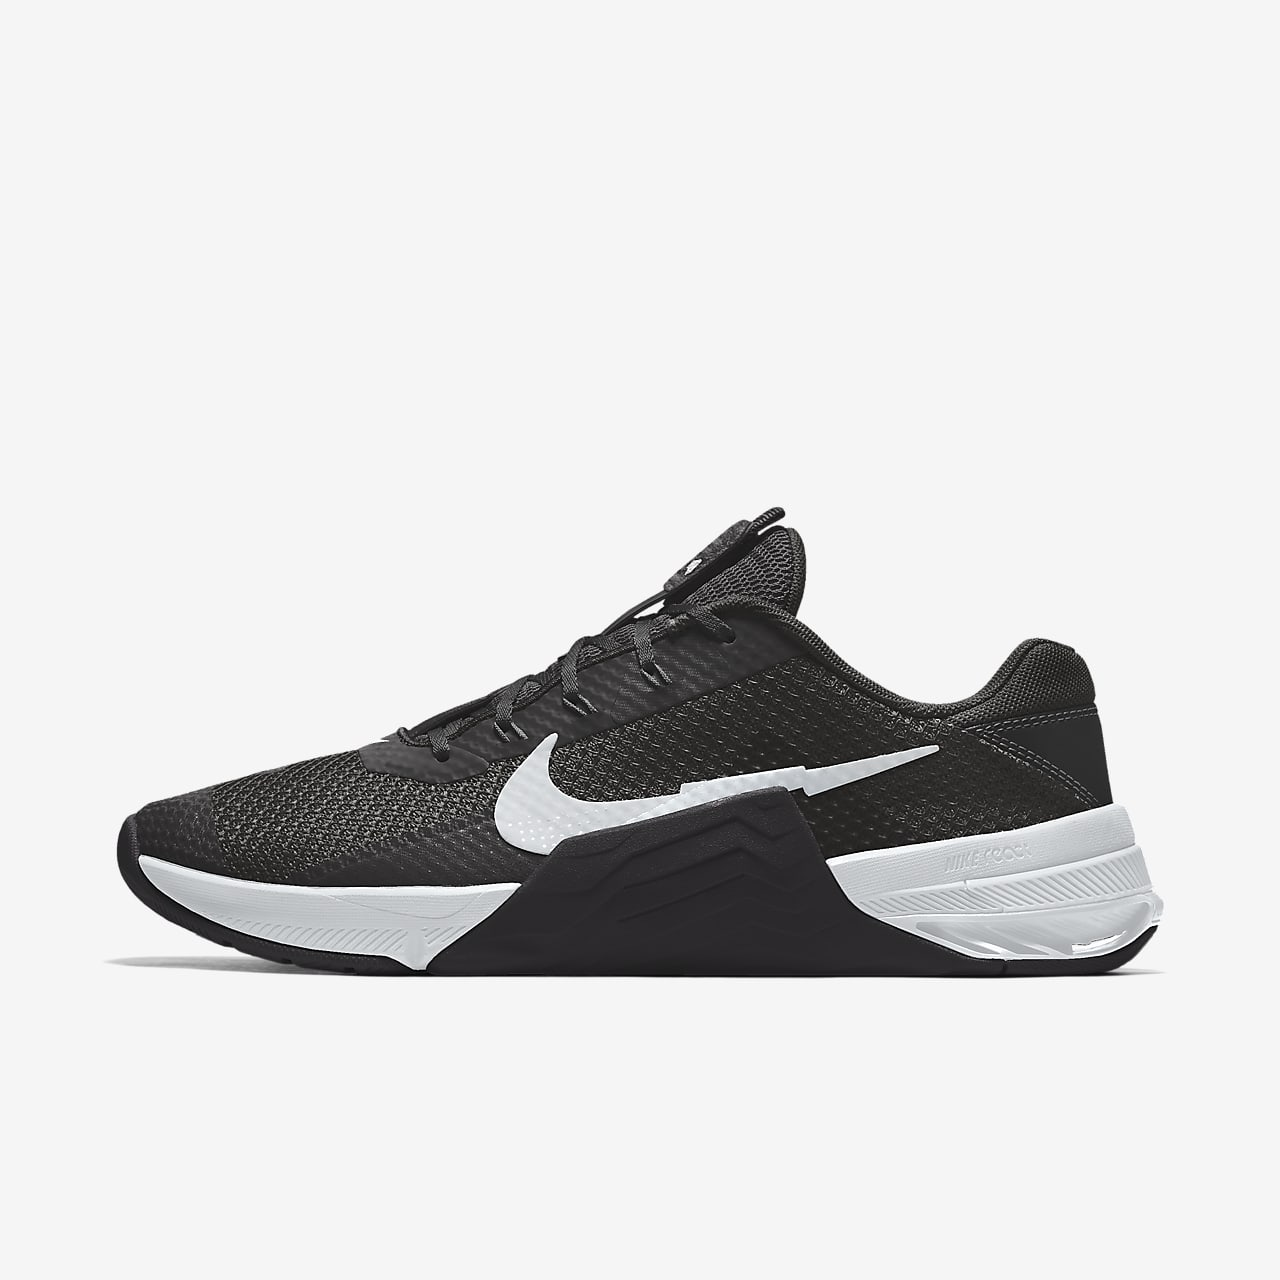 Chaussure de training personnalisée Nike Metcon 7 By You pour Homme